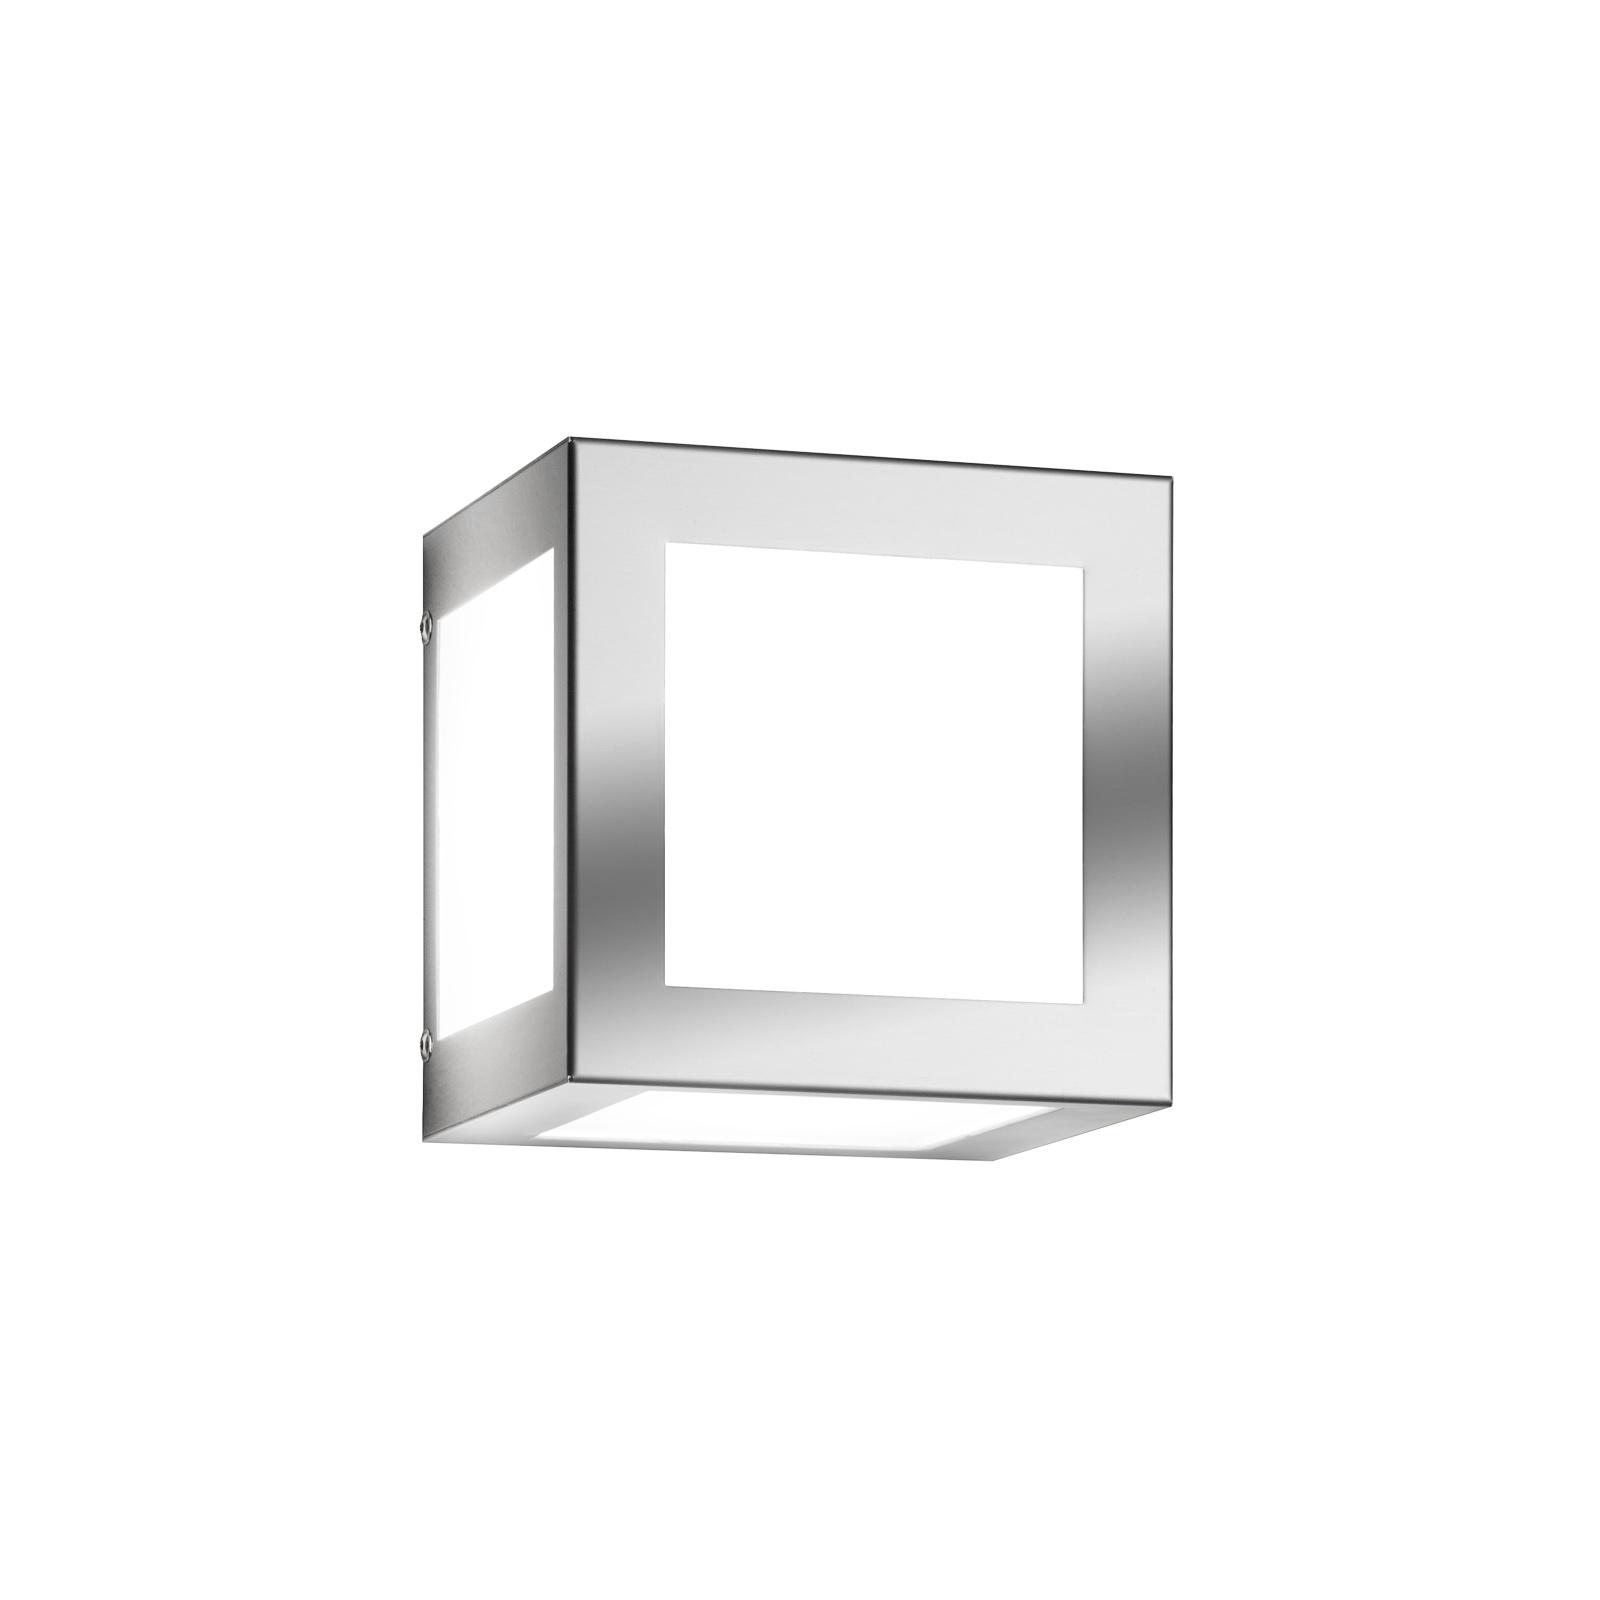 Aplique exterior cúbico Cubo acero inoxidable mate